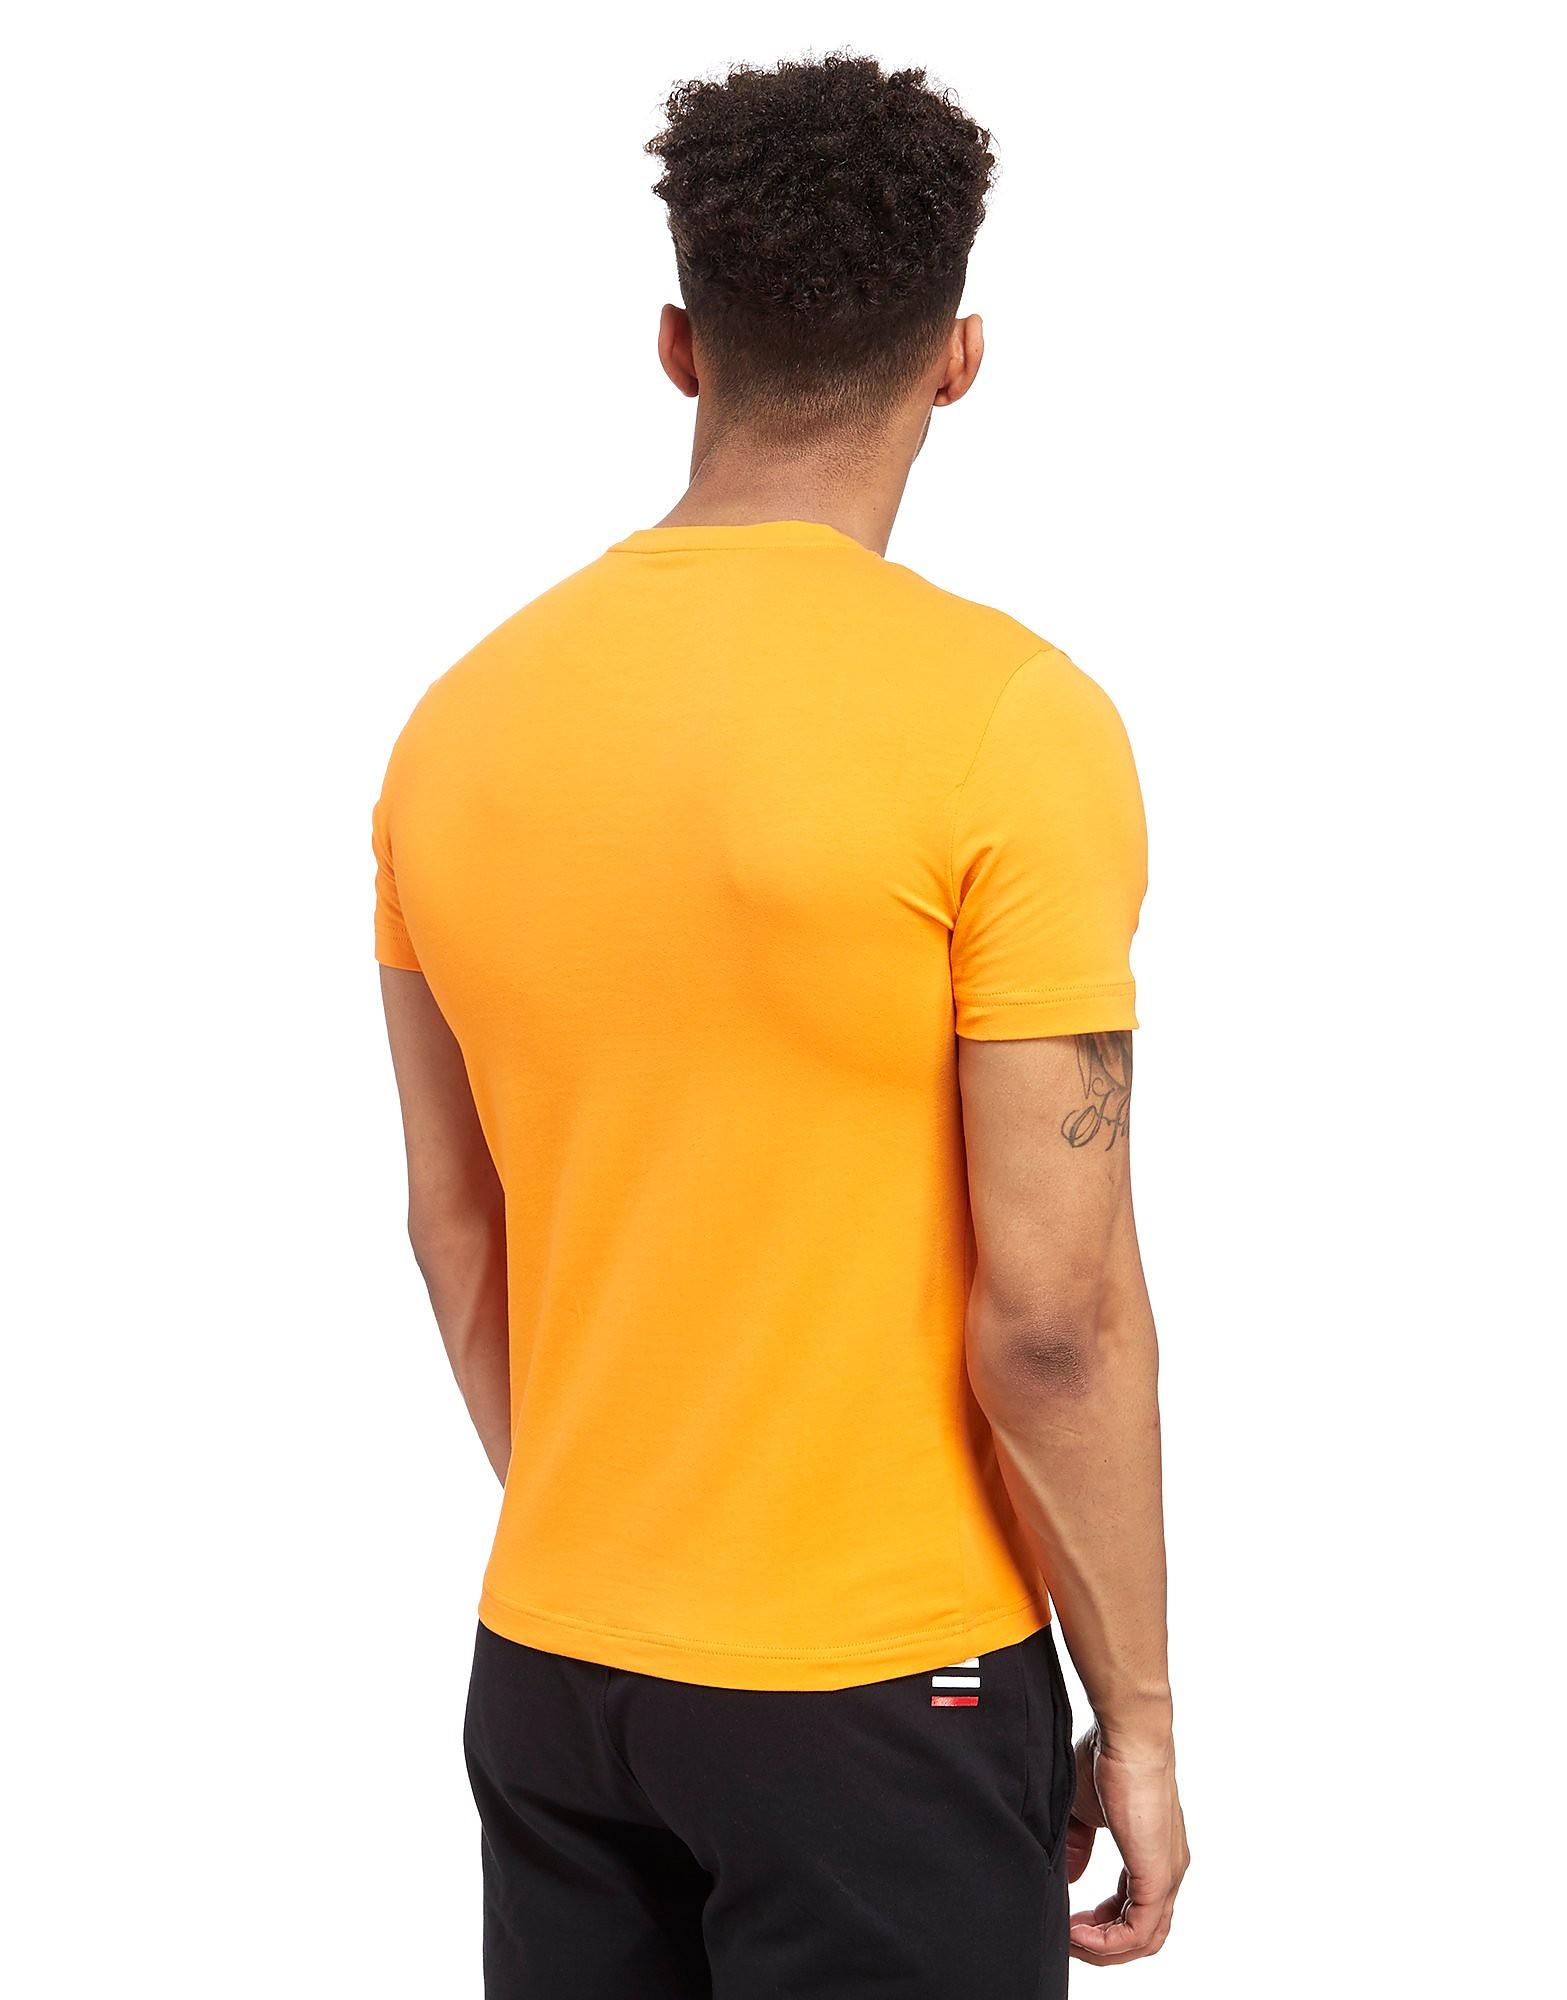 Emporio Armani EA7 Visibility T-Shirt